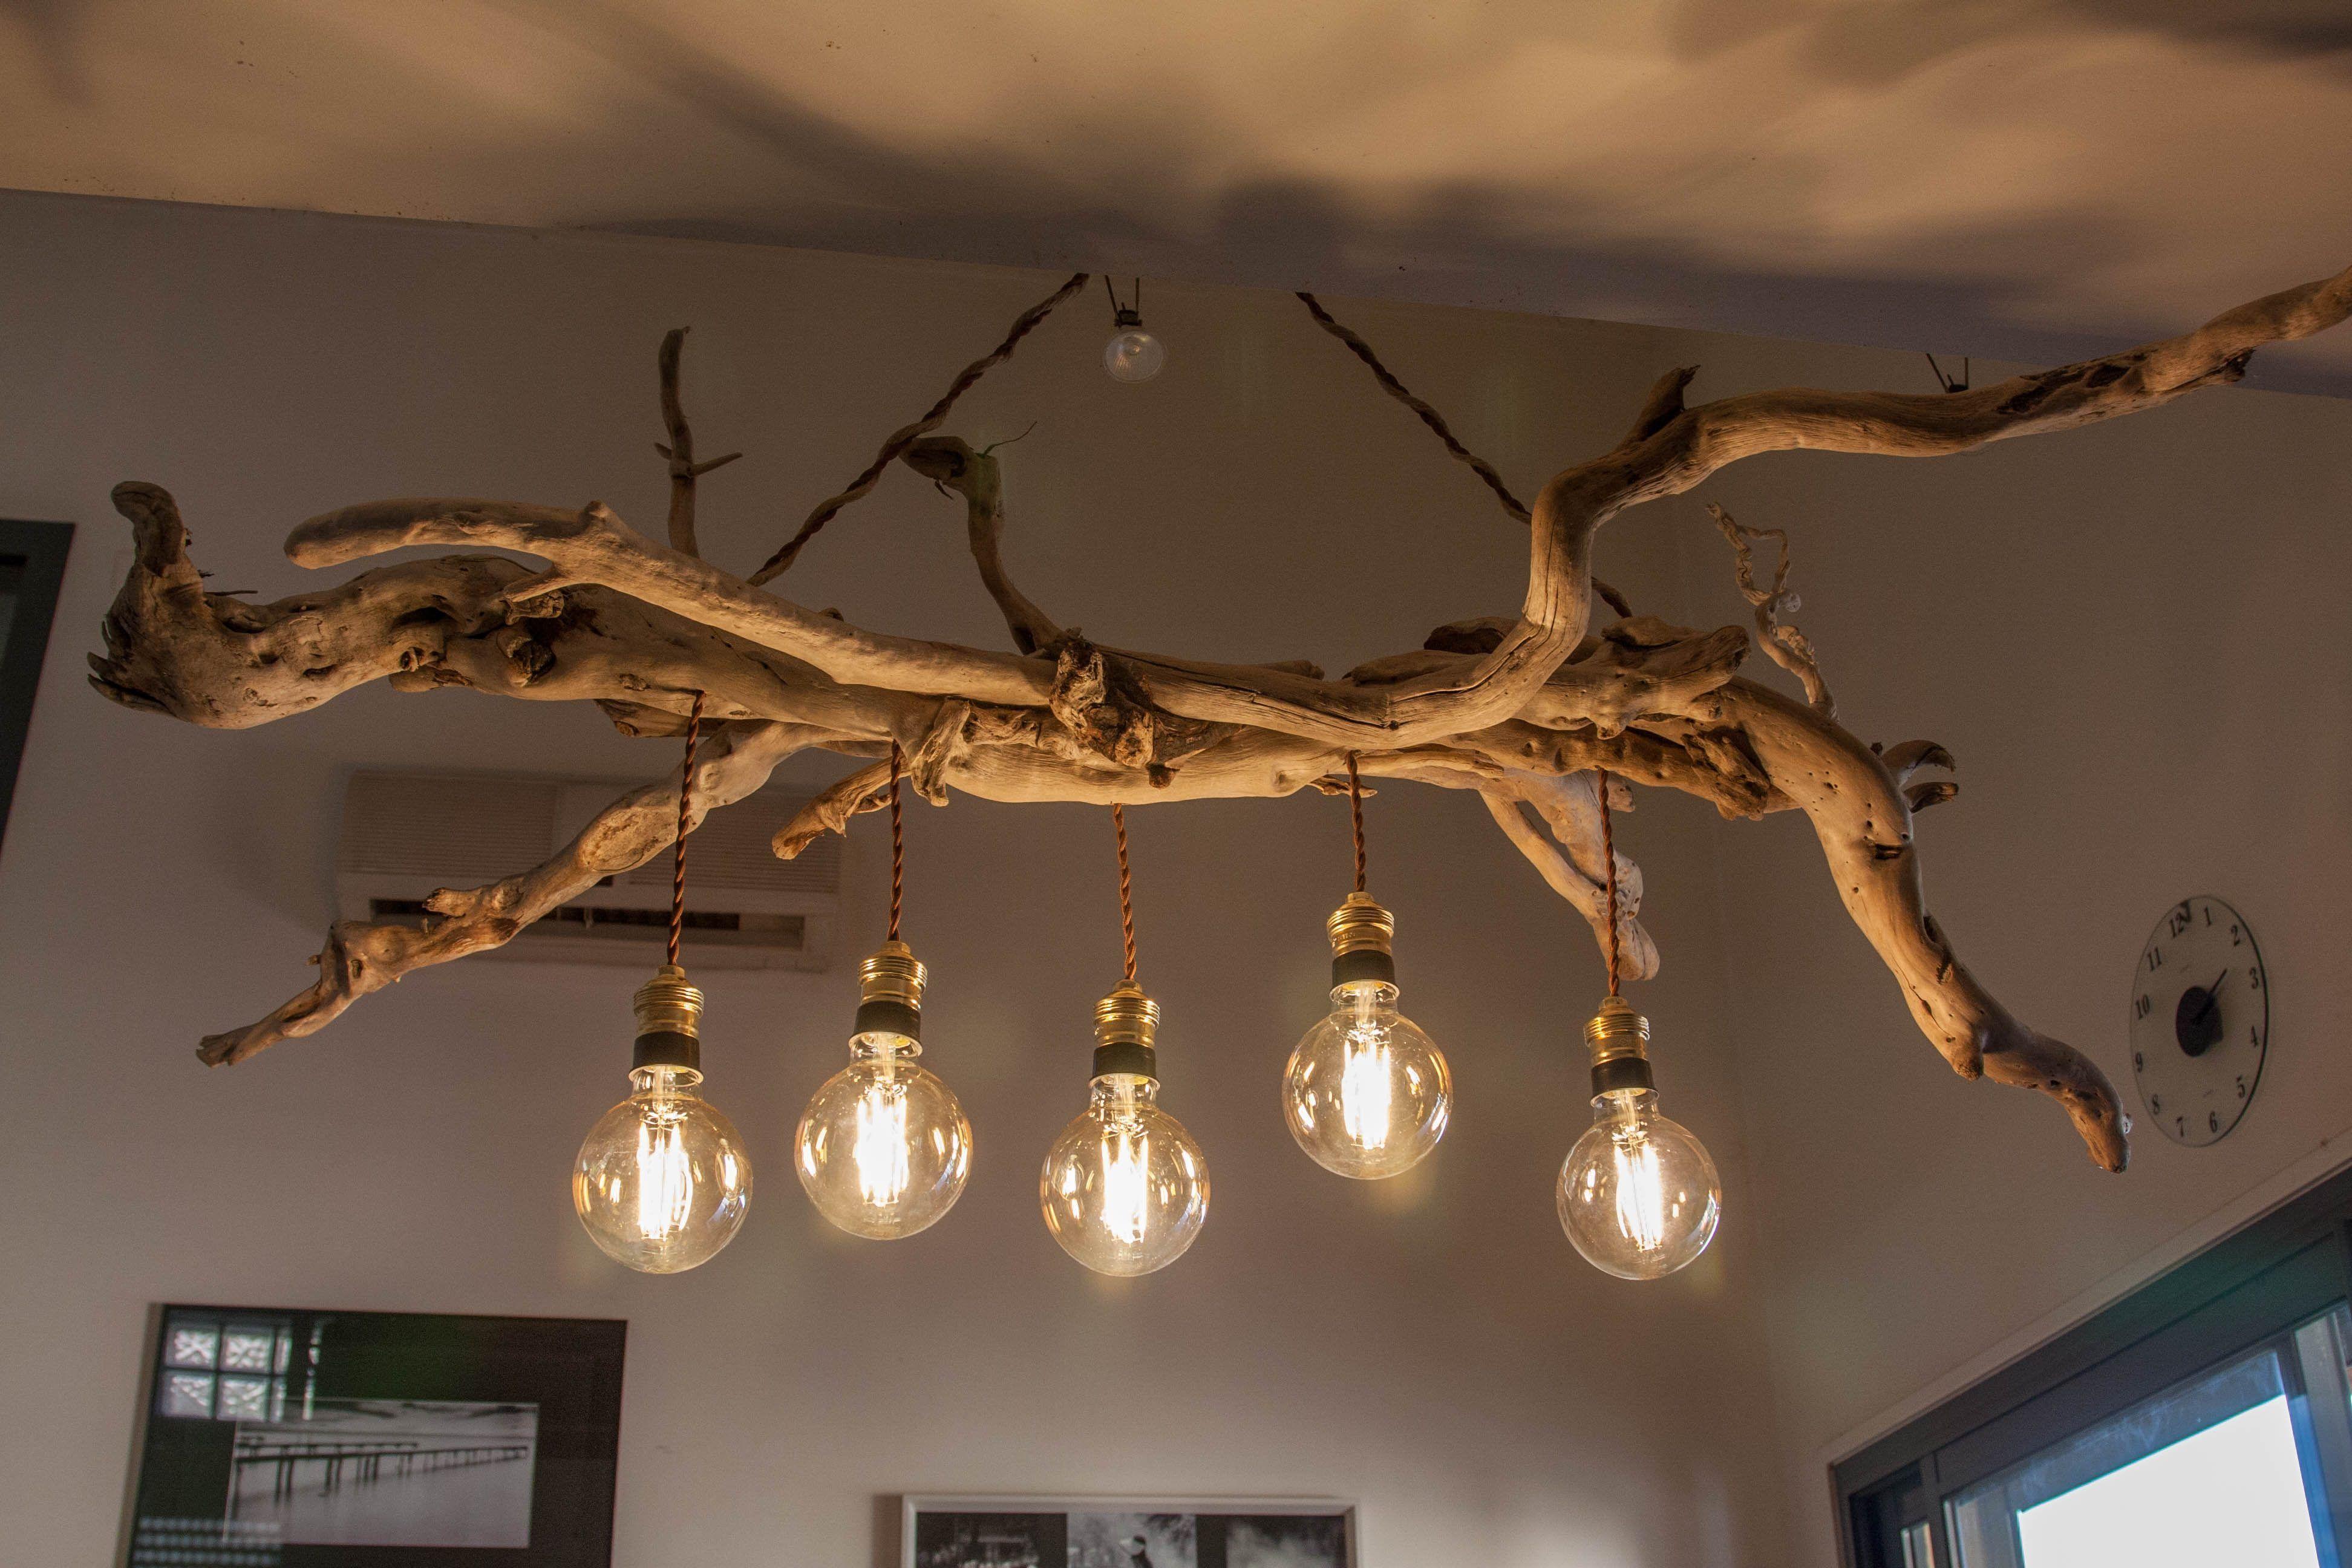 16 Beautiful Diy Wood Lamps Driftwood Chandelier Diy Chandelier Wooden Chandelier